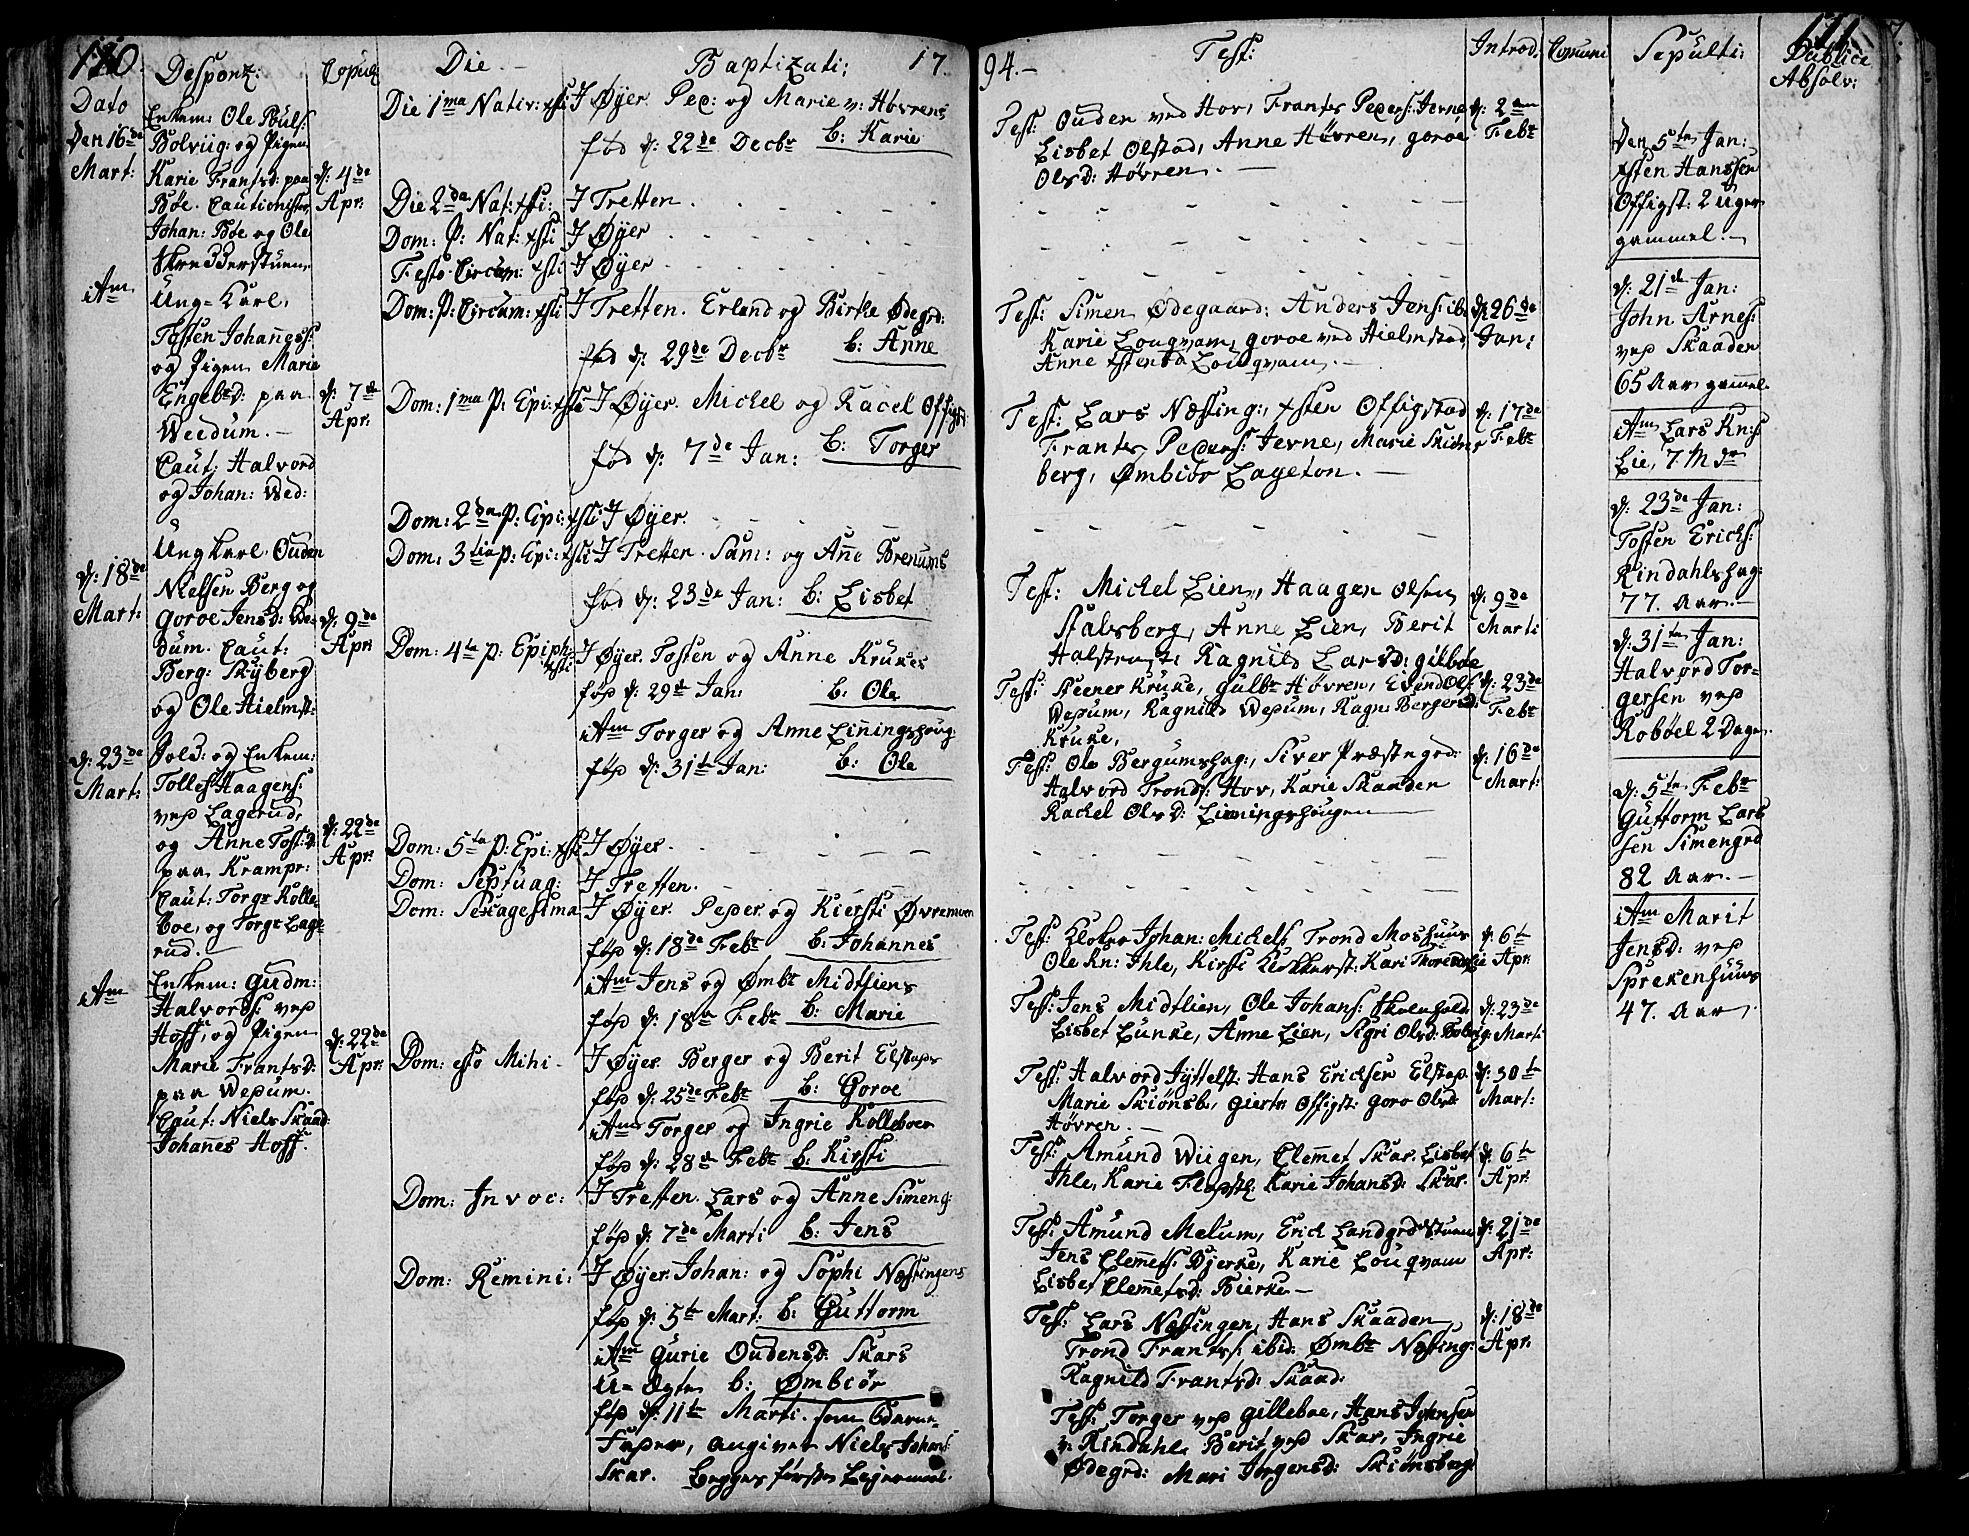 SAH, Øyer prestekontor, Ministerialbok nr. 3, 1784-1824, s. 110-111